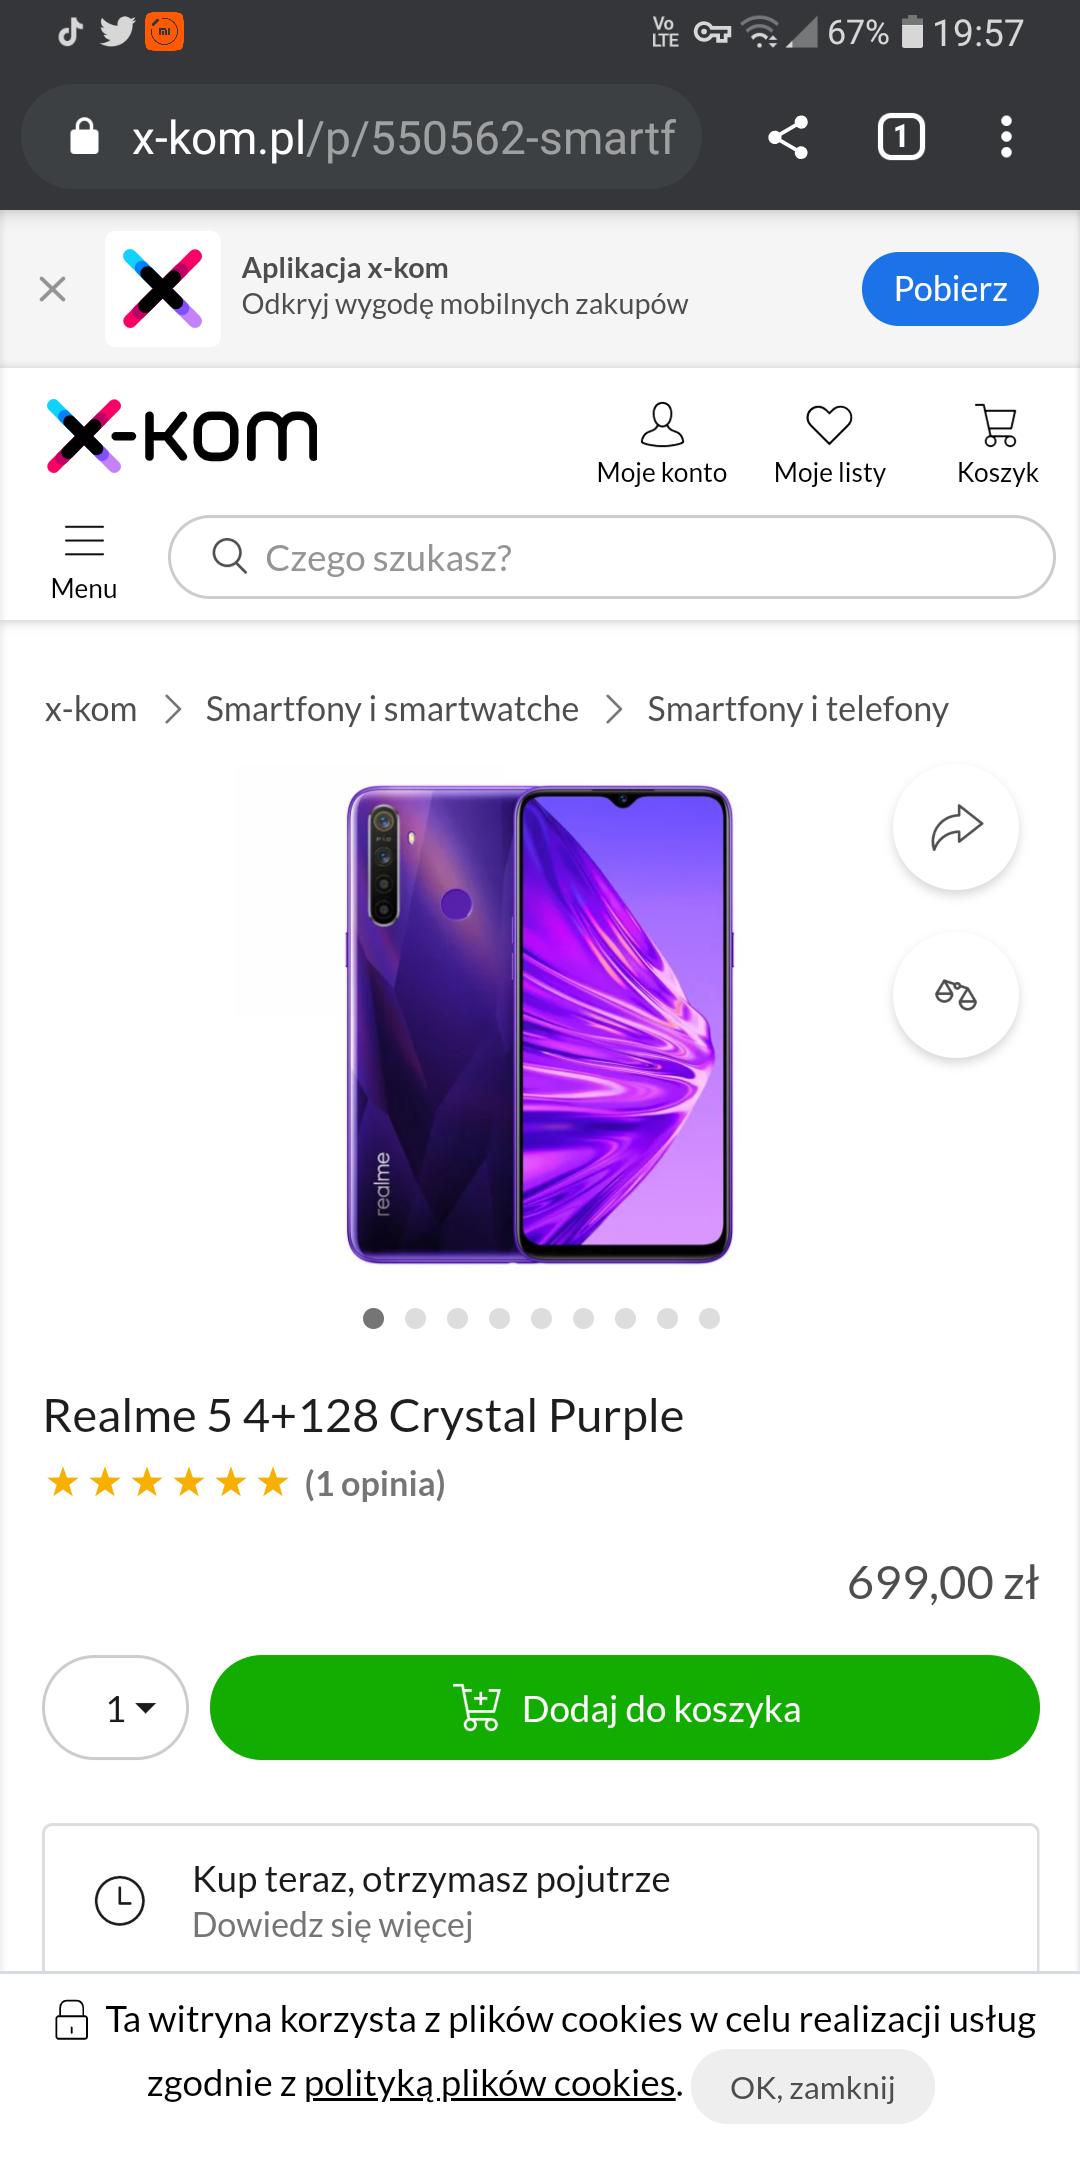 Realme 5 4+128 Crystal Purple